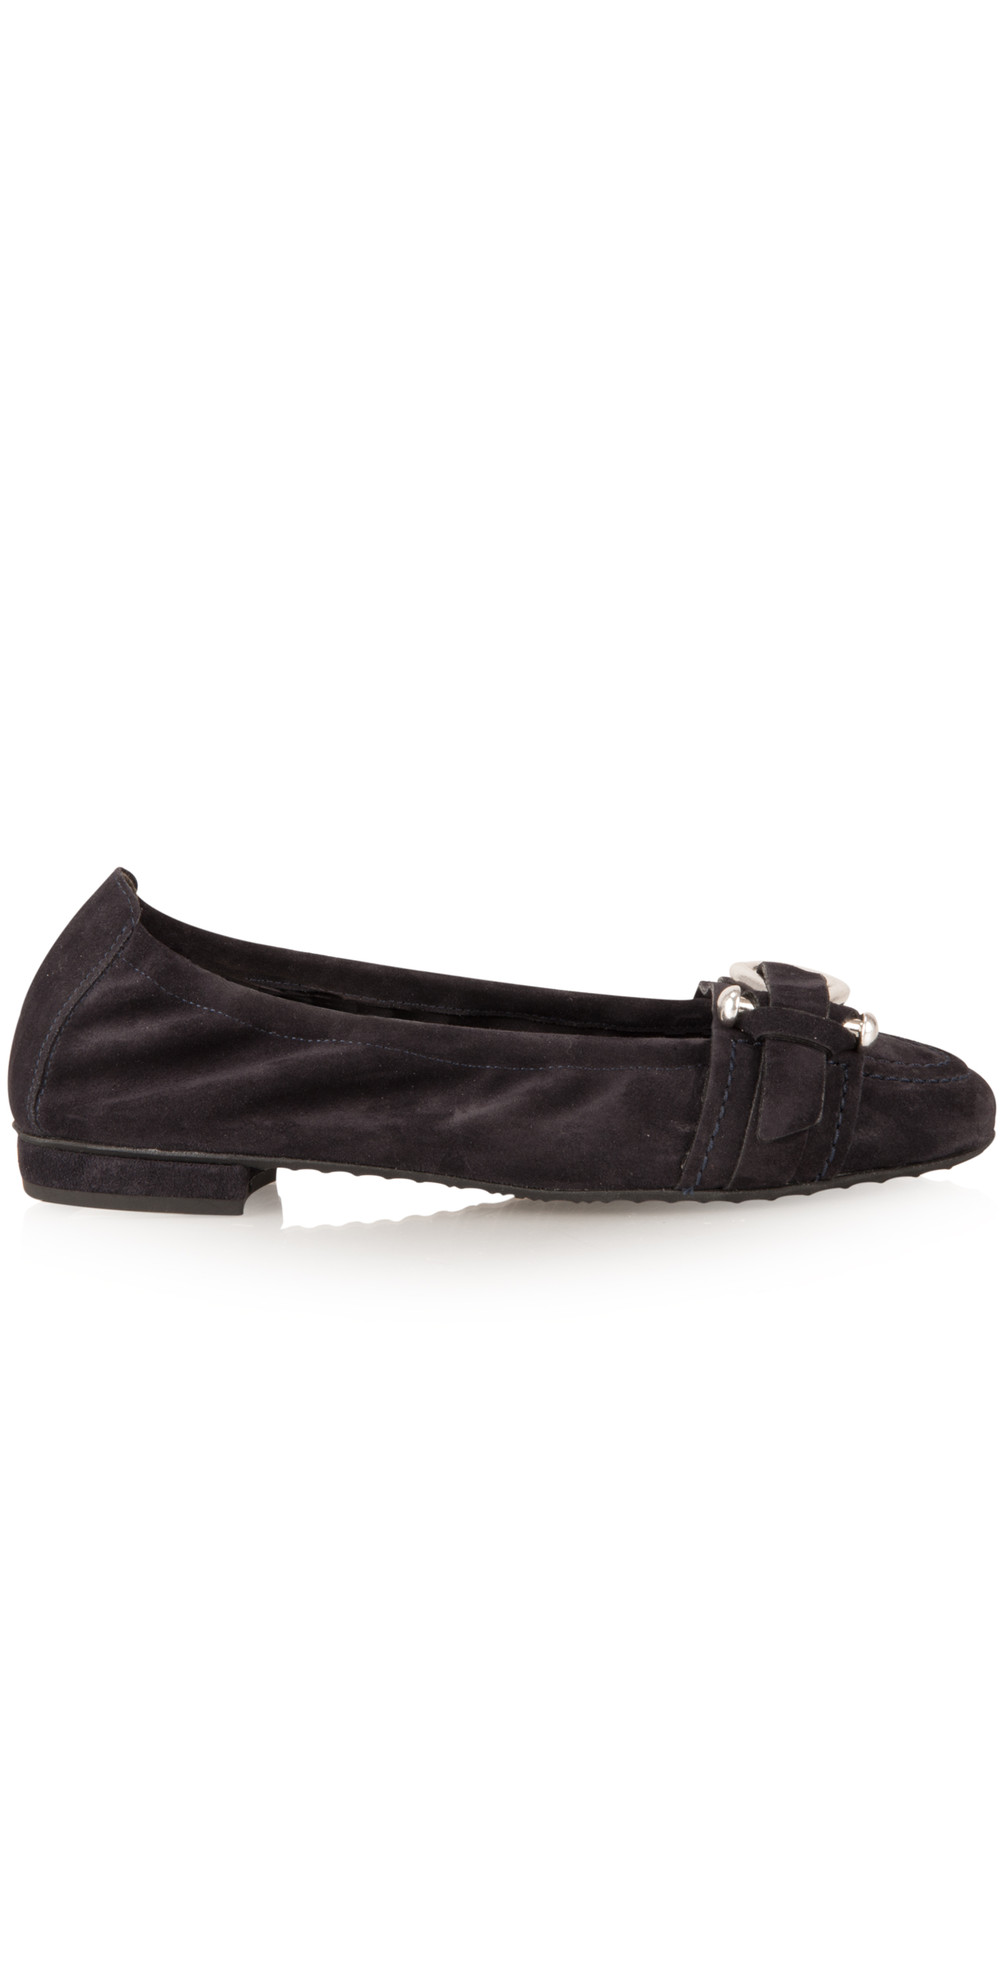 kennel und schmenger malu suede buckle shoe in pacific. Black Bedroom Furniture Sets. Home Design Ideas